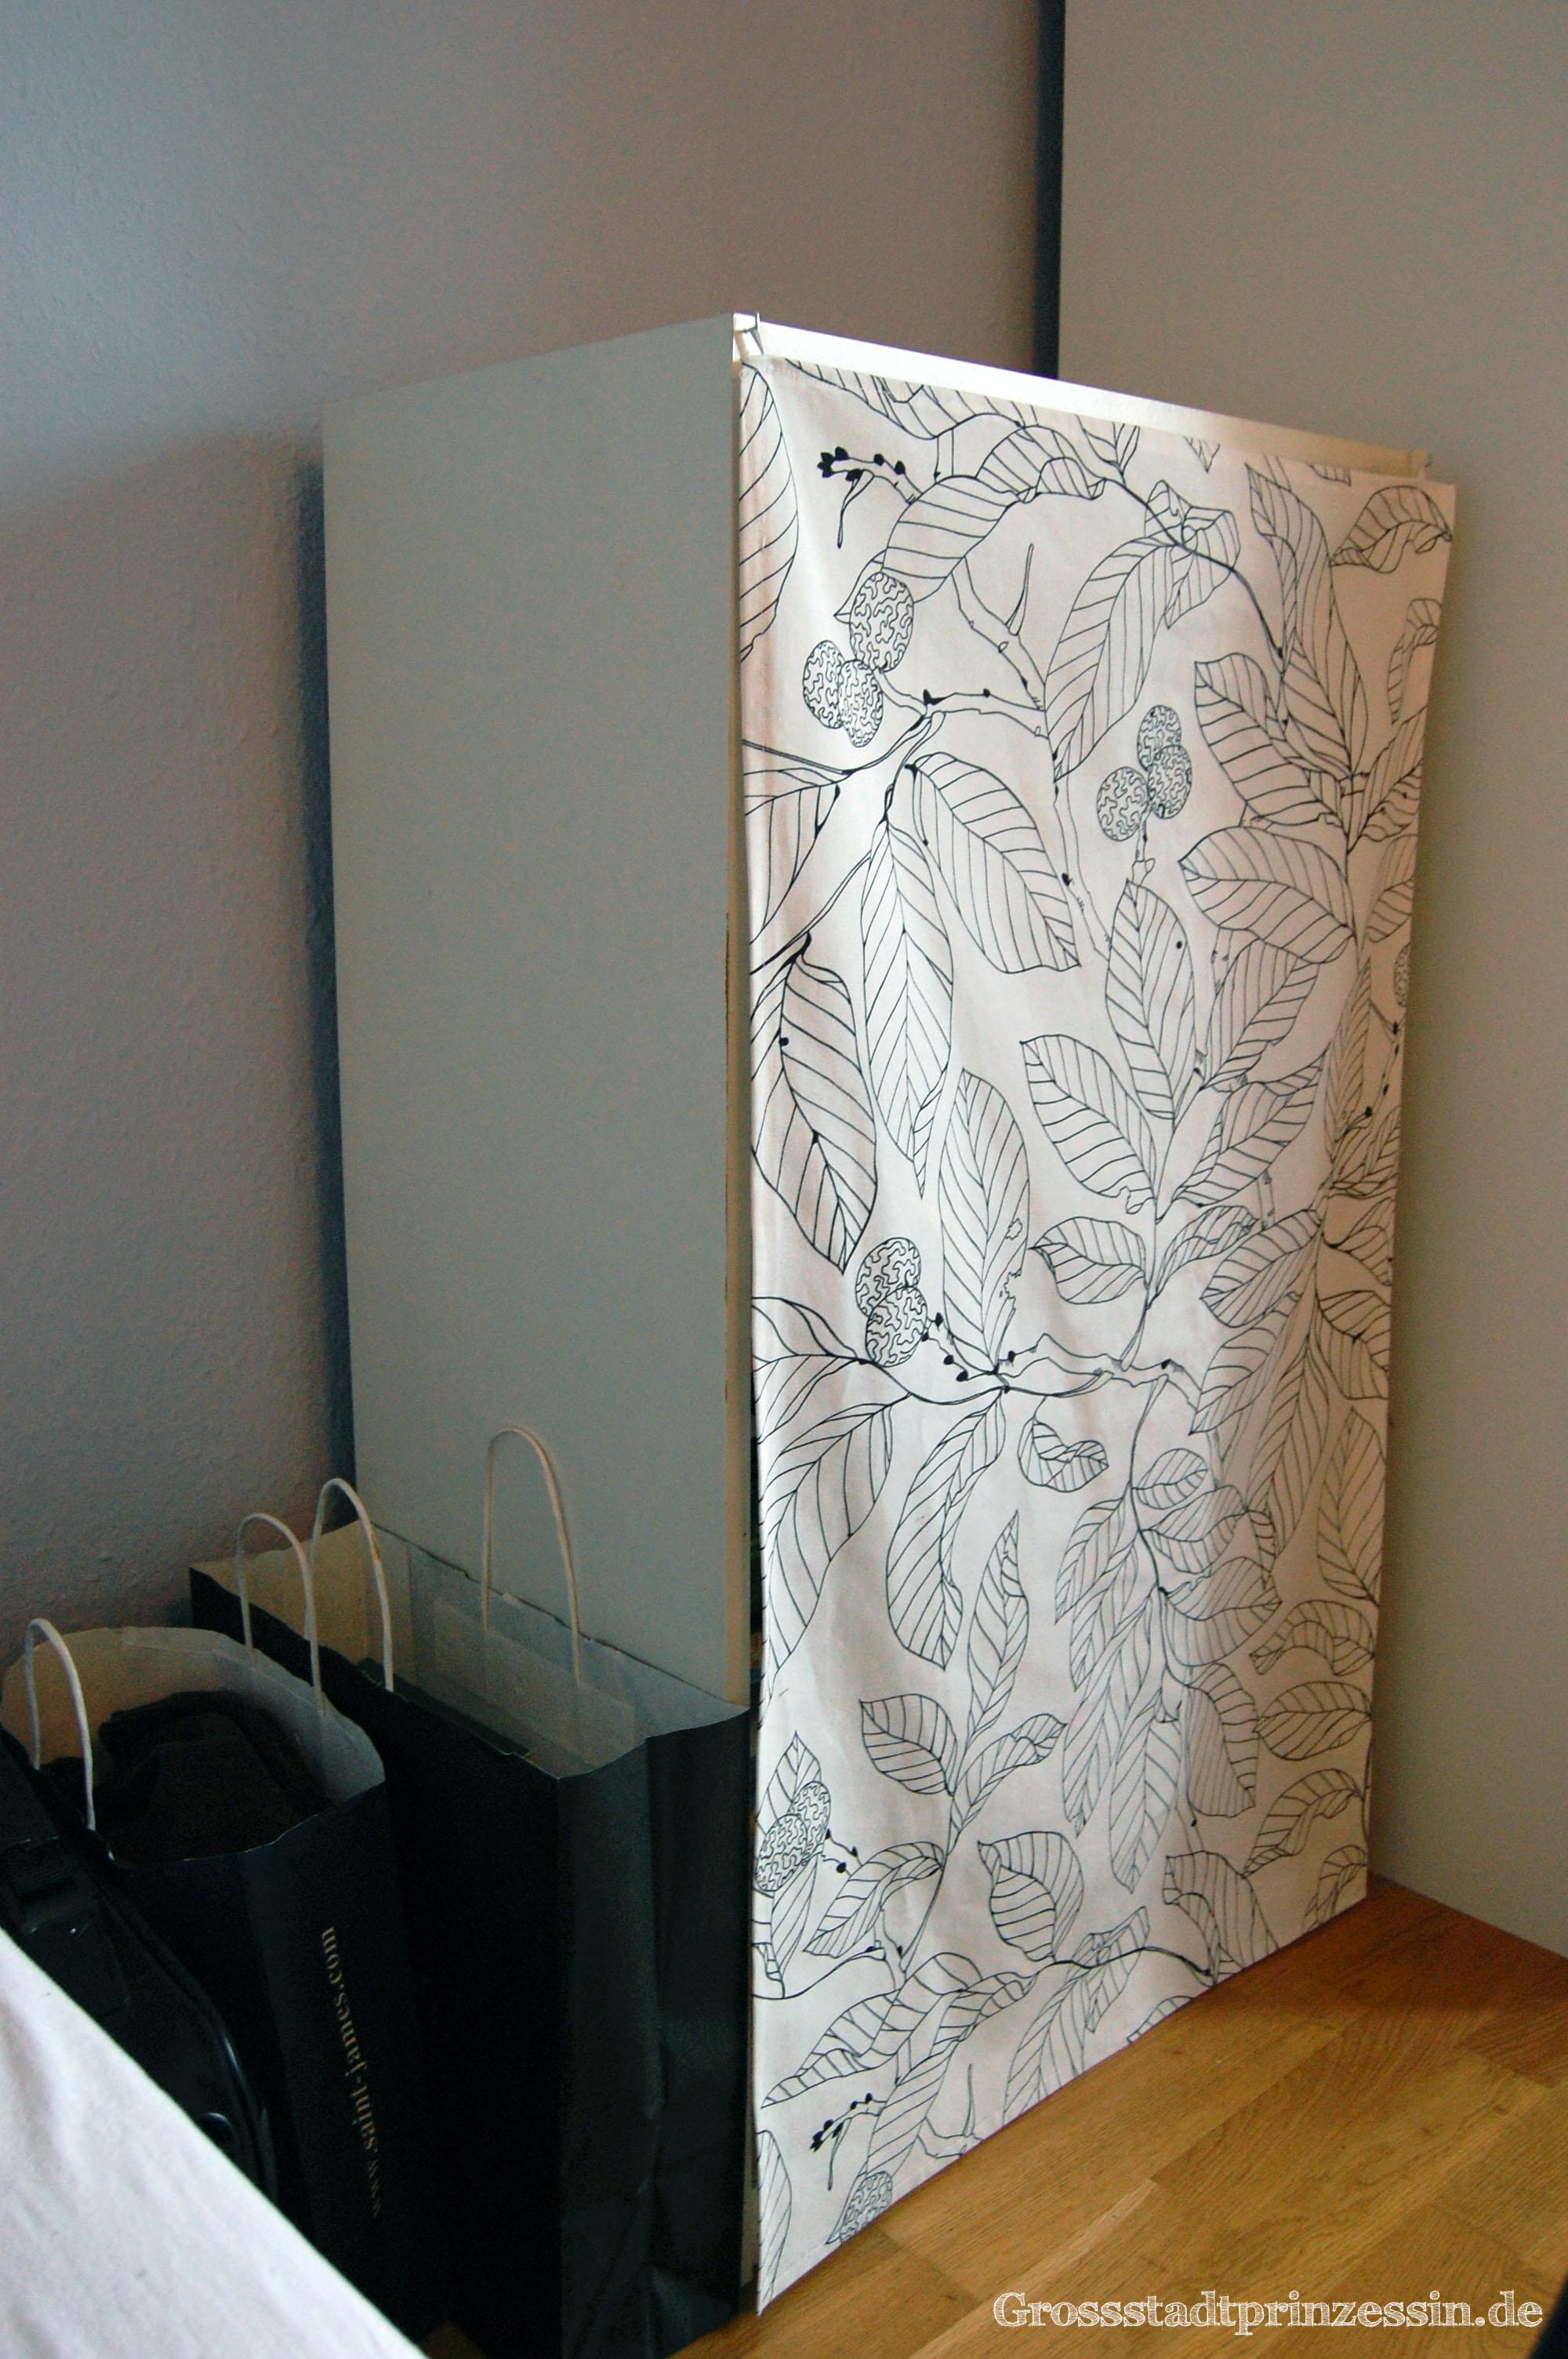 Gardinen deko vorhang k chenregal gardinen dekoration for Gardinen obi